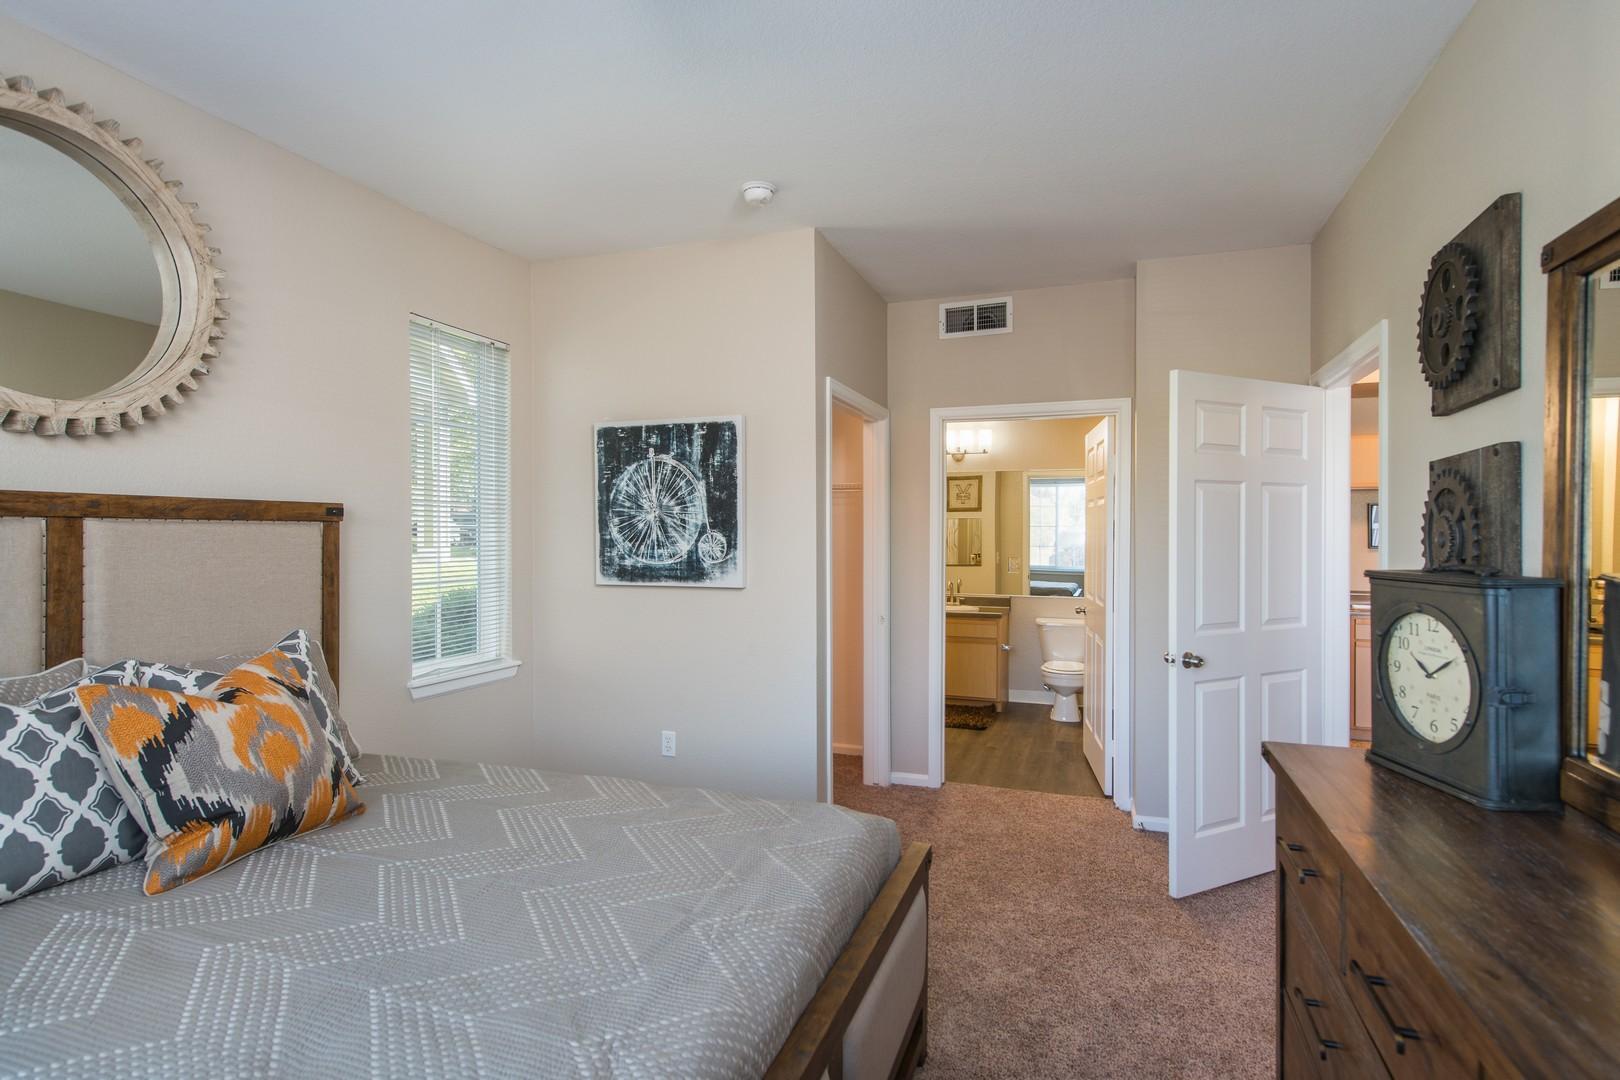 Peakview At T Bone Ranch Apartments Greeley Co Walk Score